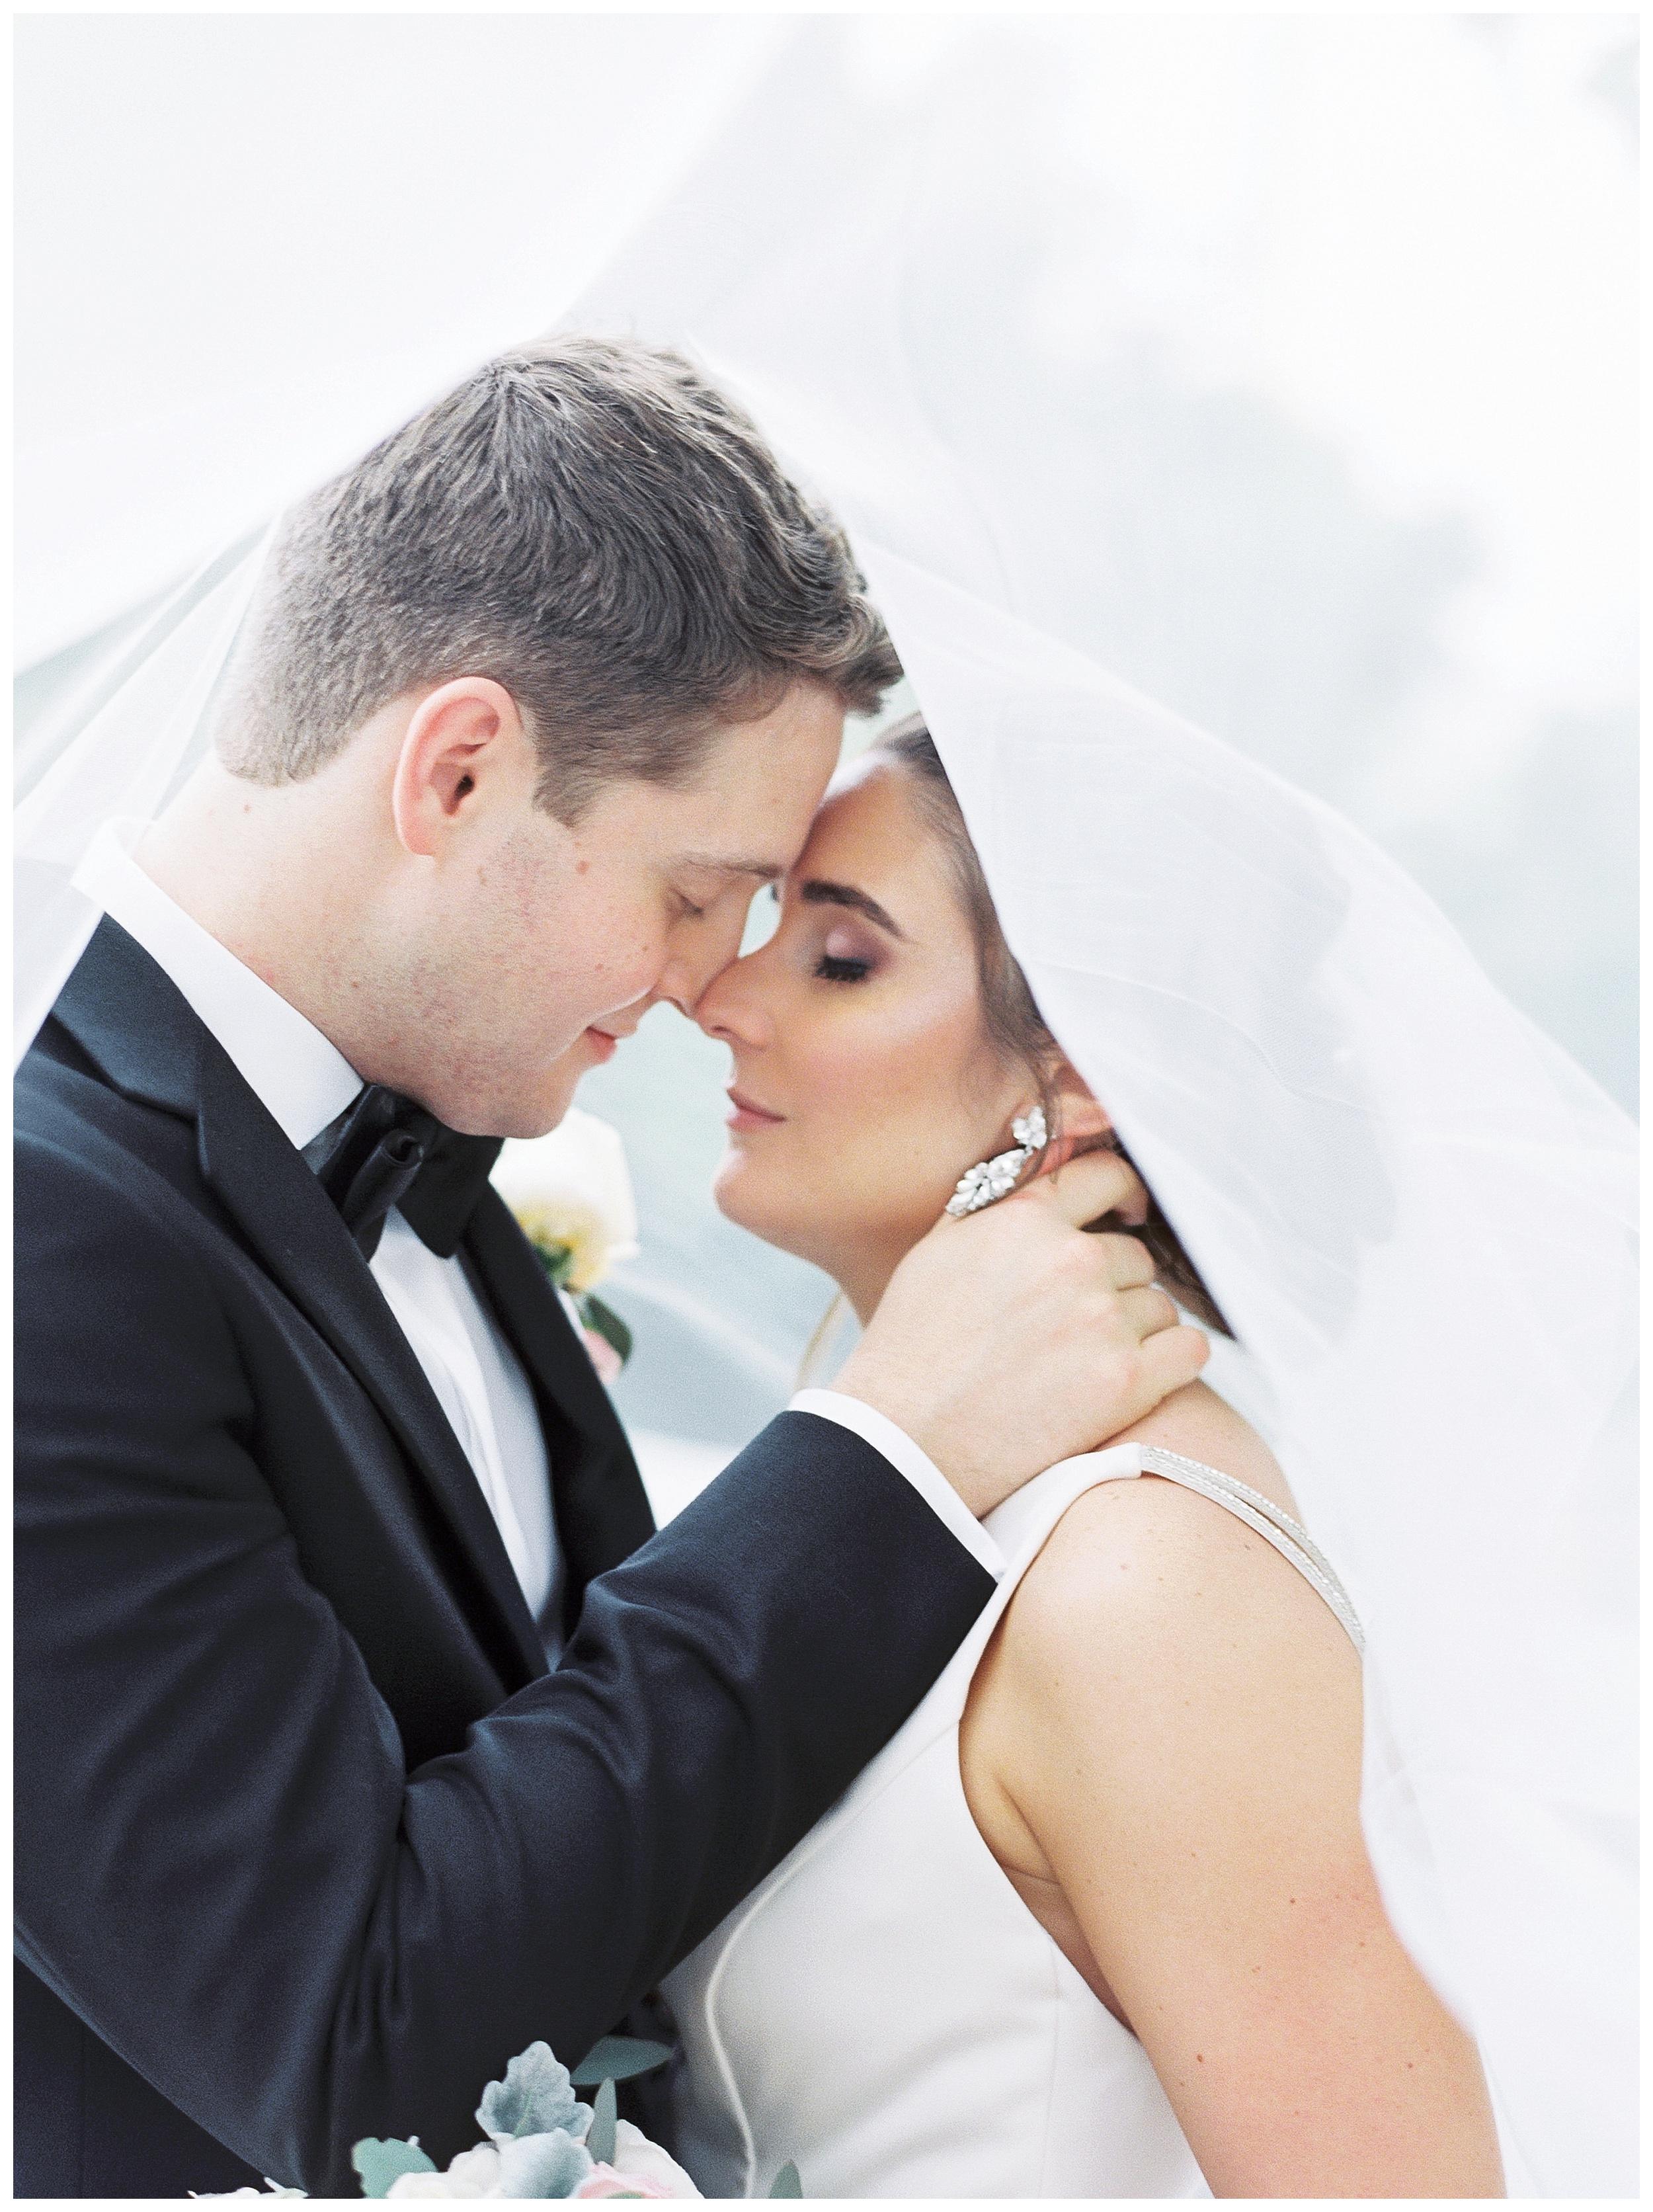 DAR Constitution Hall Wedding Wedding | Daughters of the American Revolution Wedding | District of Columbia Film Wedding Photographer Kir Tuben_0090.jpg